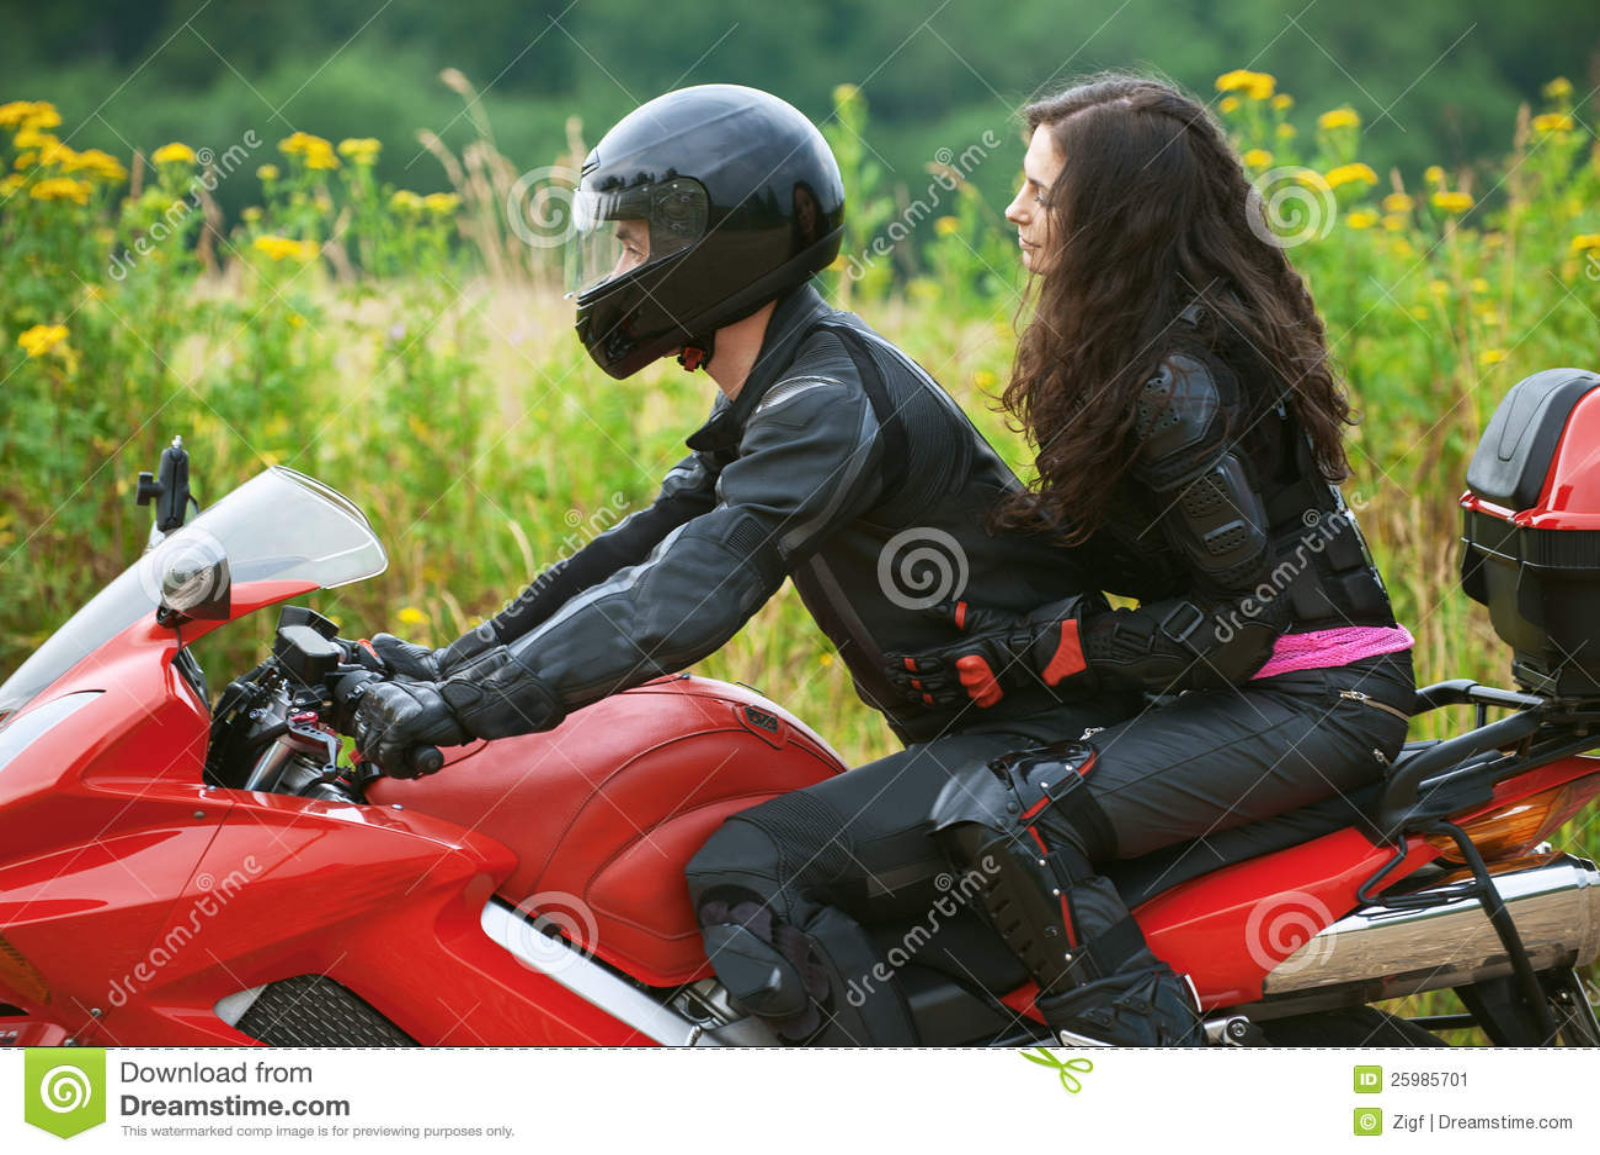 Фото девушек на мотоцикле в шлеме с парнем